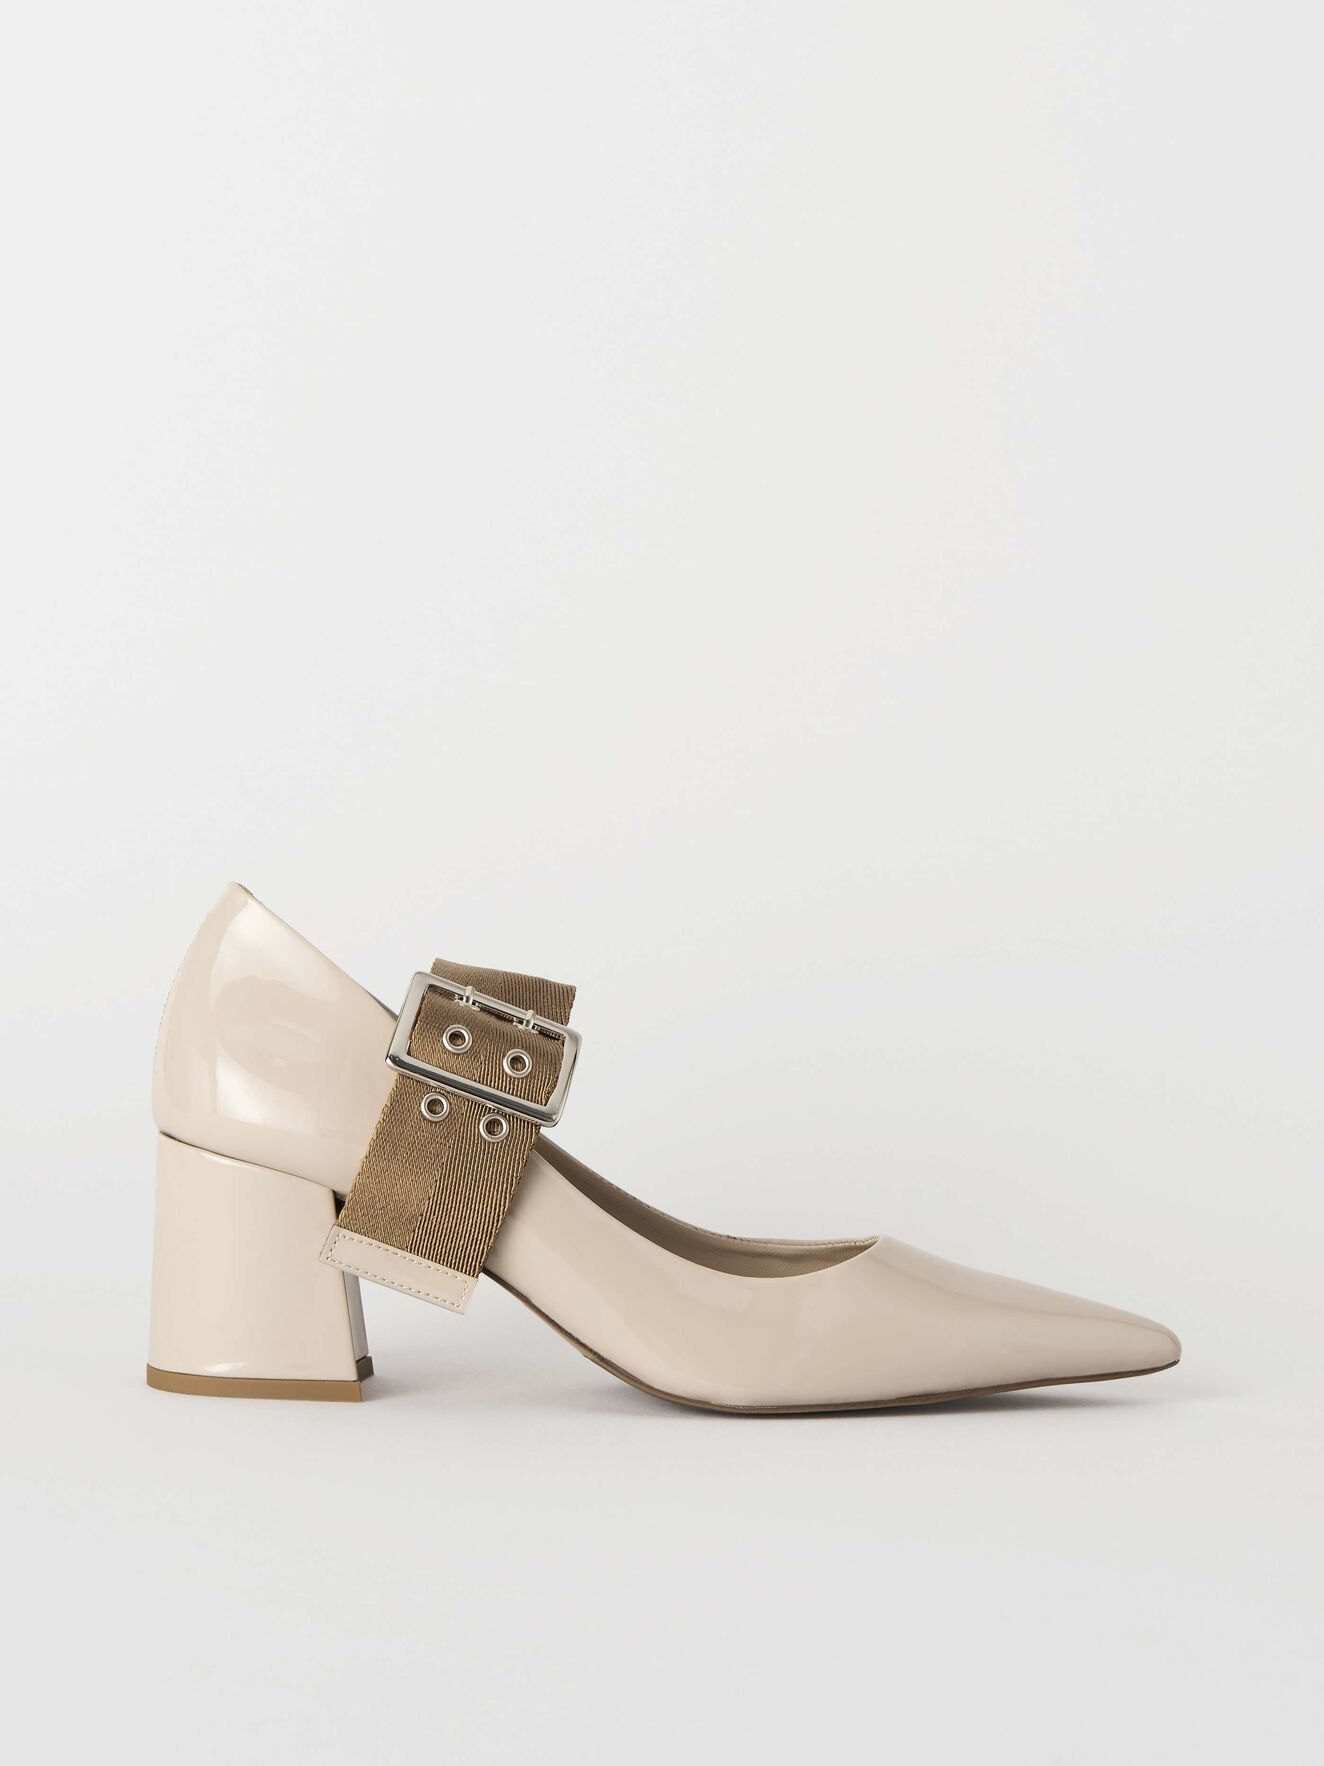 696a1331a Shoes - Shop women's designer shoes online at Tiger of Sweden